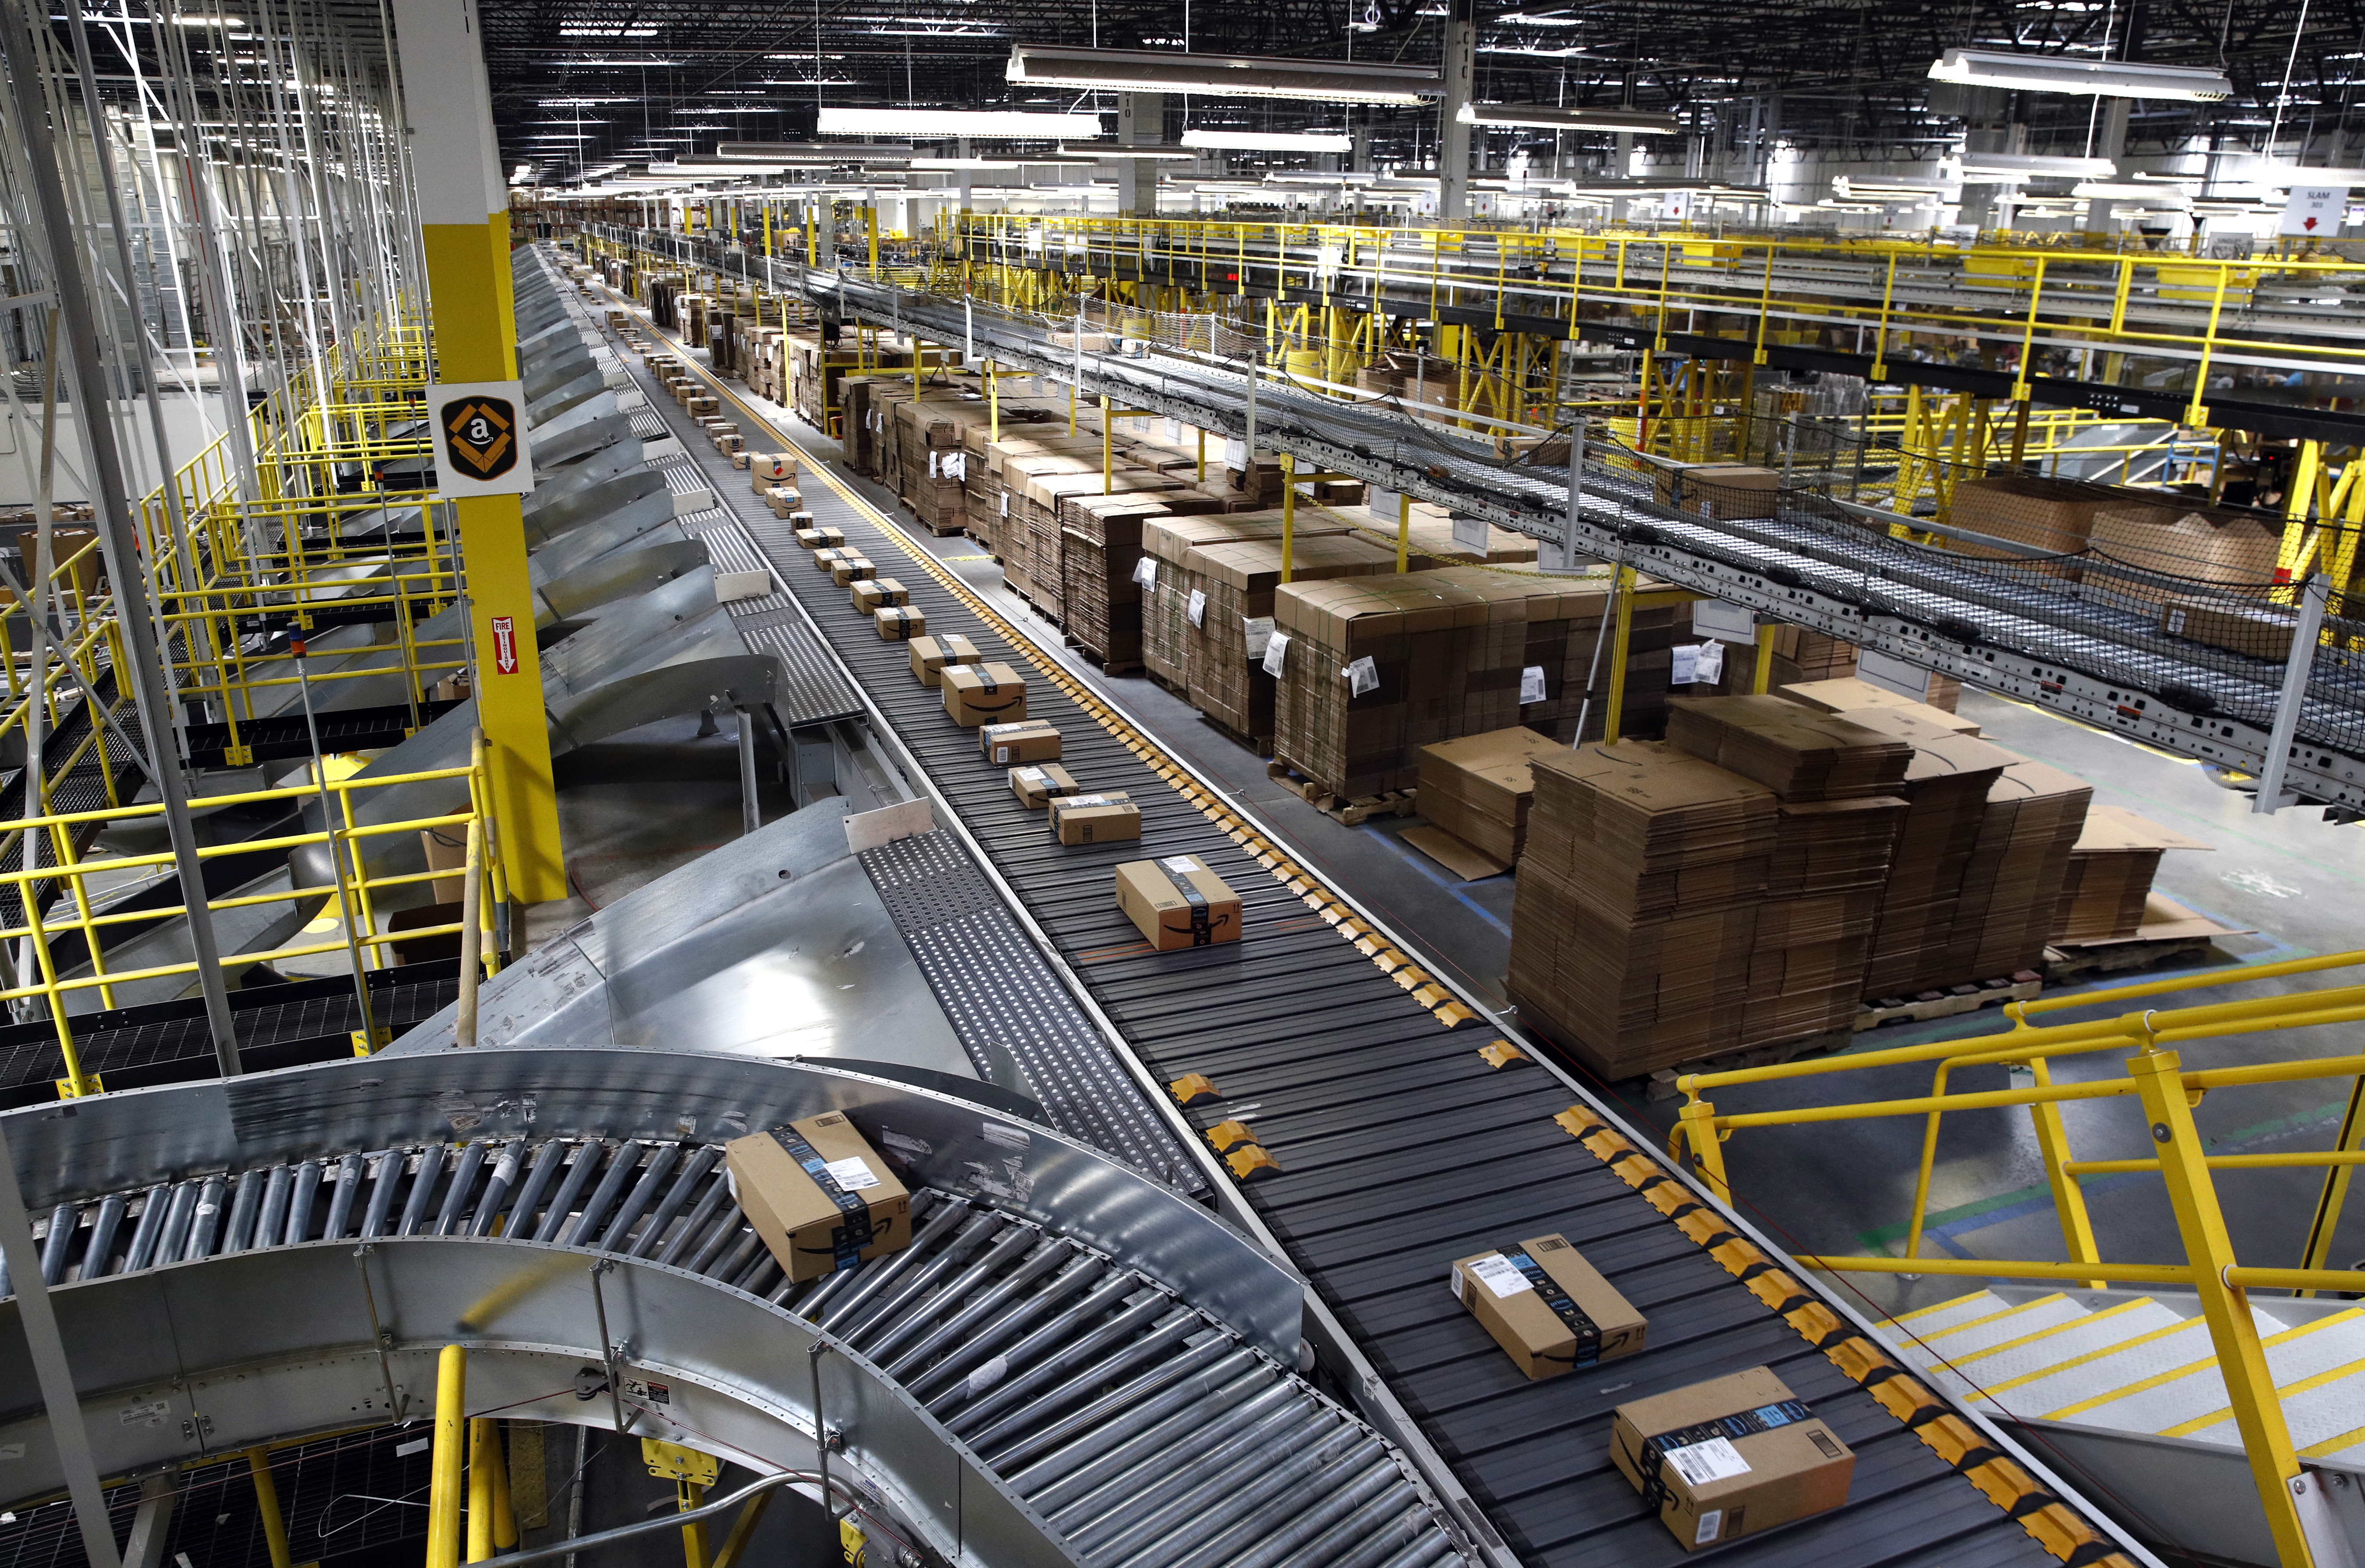 NLR center said planned by Amazon | Arkansas Democrat-Gazette